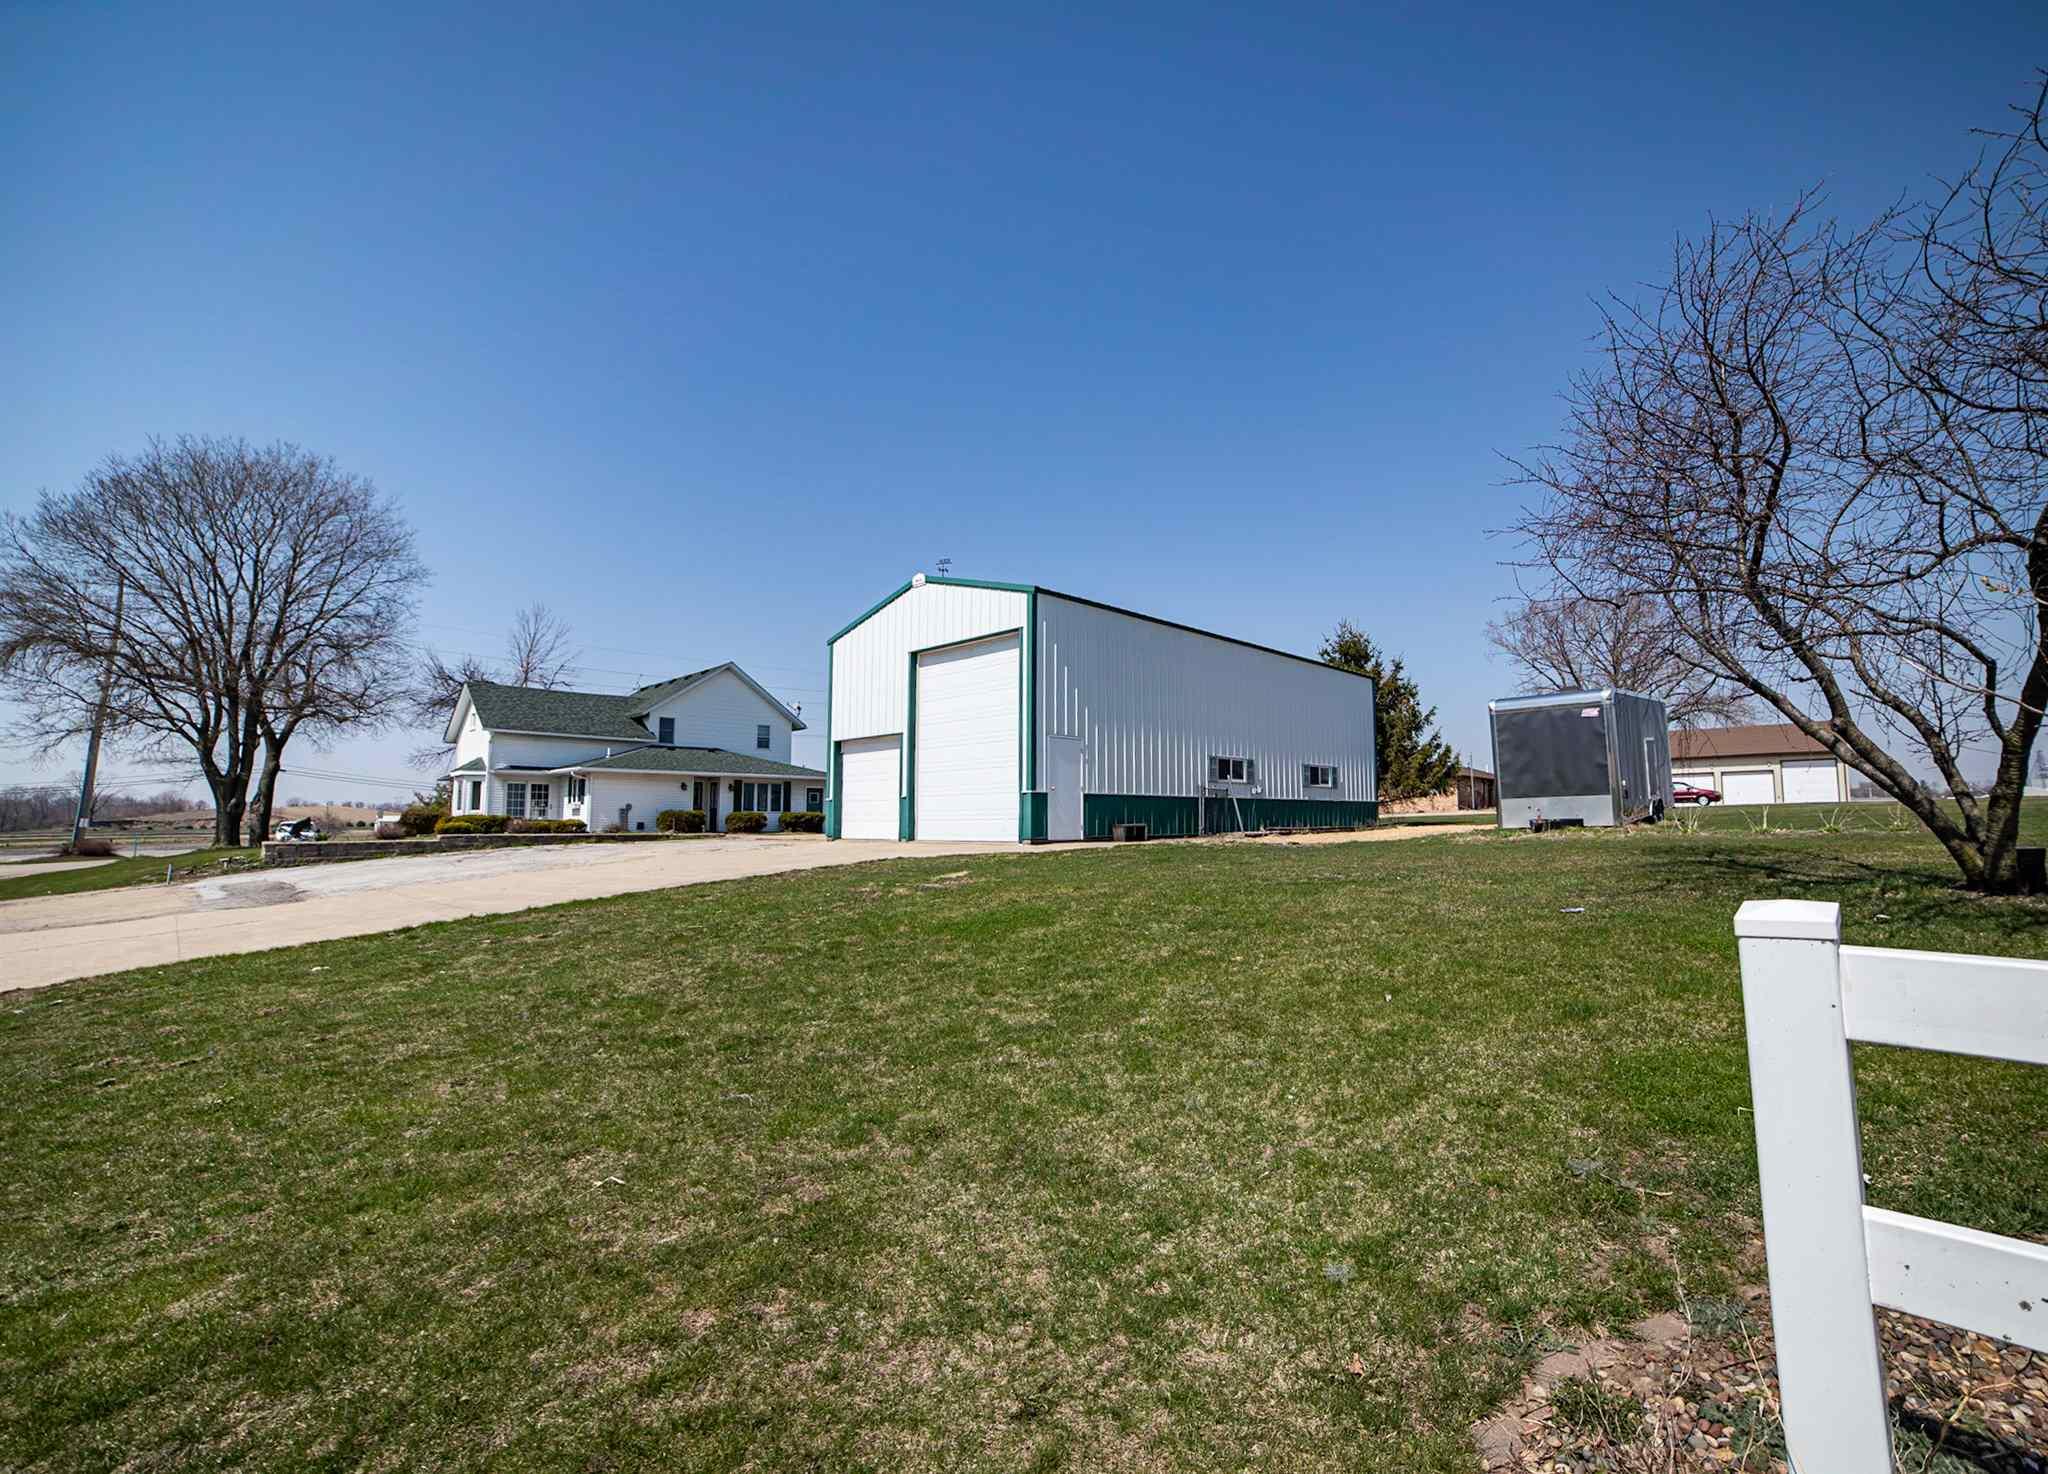 620 S 6TH Property Photo - De Witt, IA real estate listing